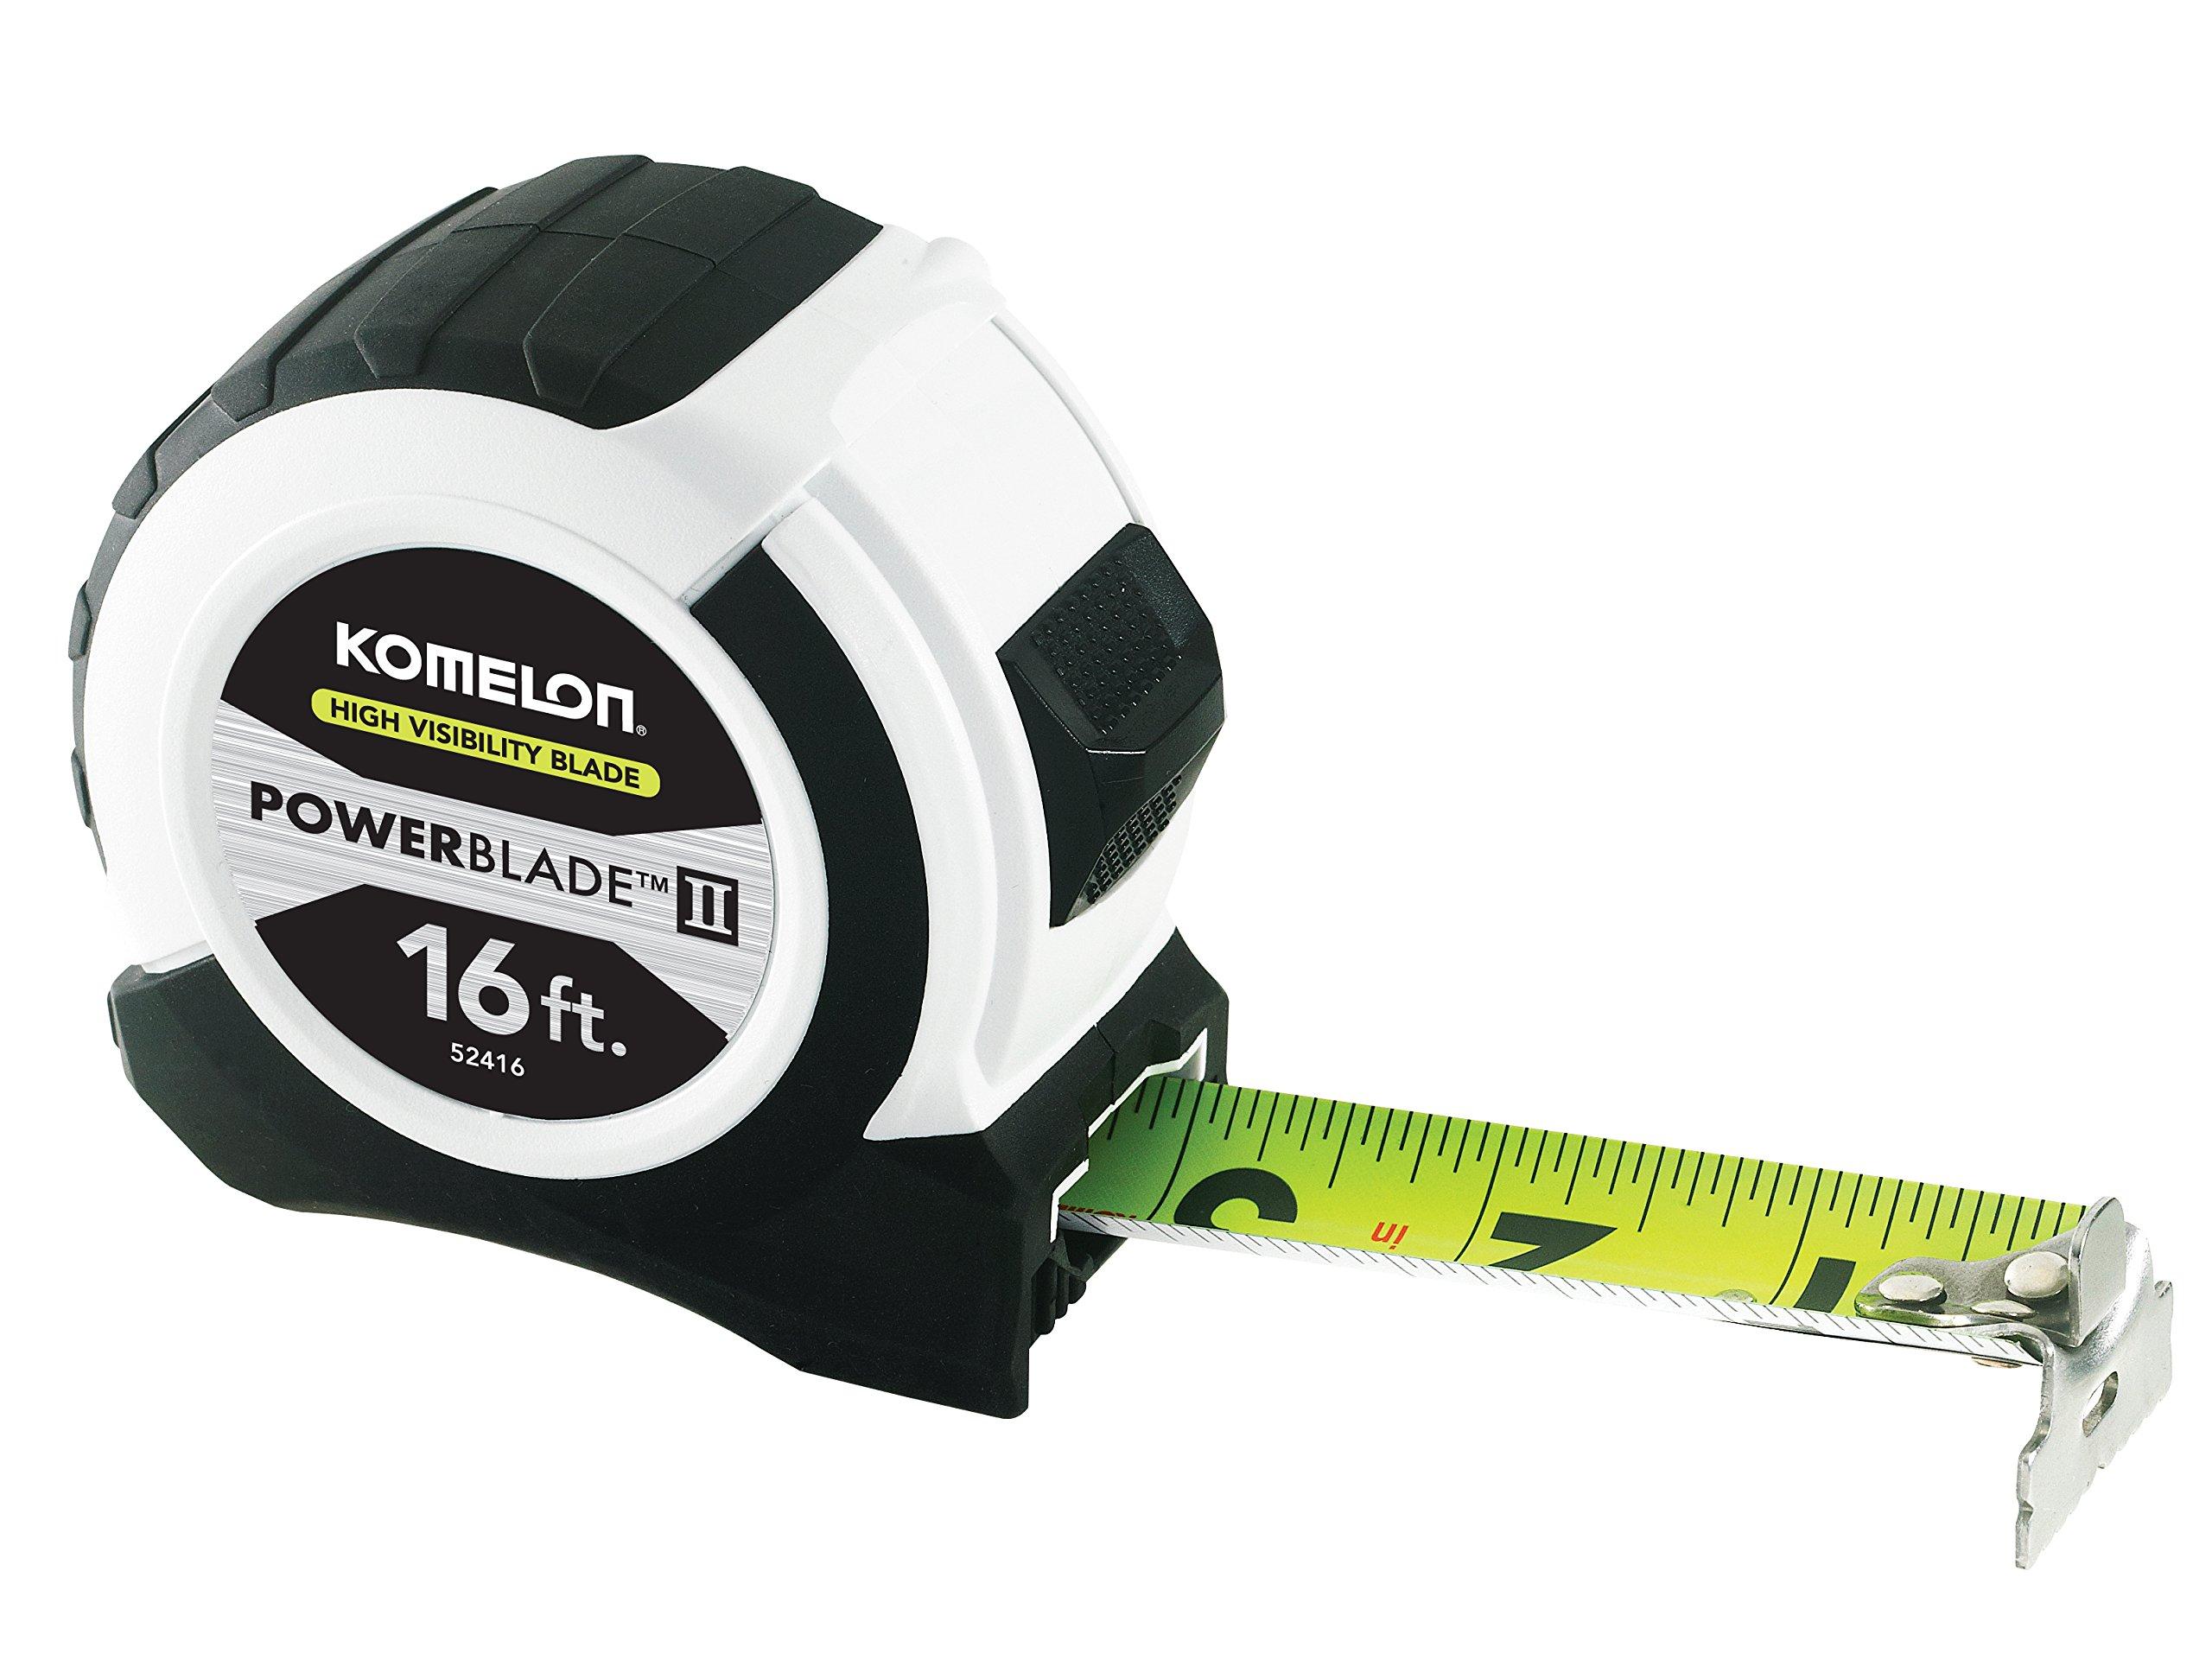 Komelon 52416 Powerblade II Tape Measures, Small, White/Black